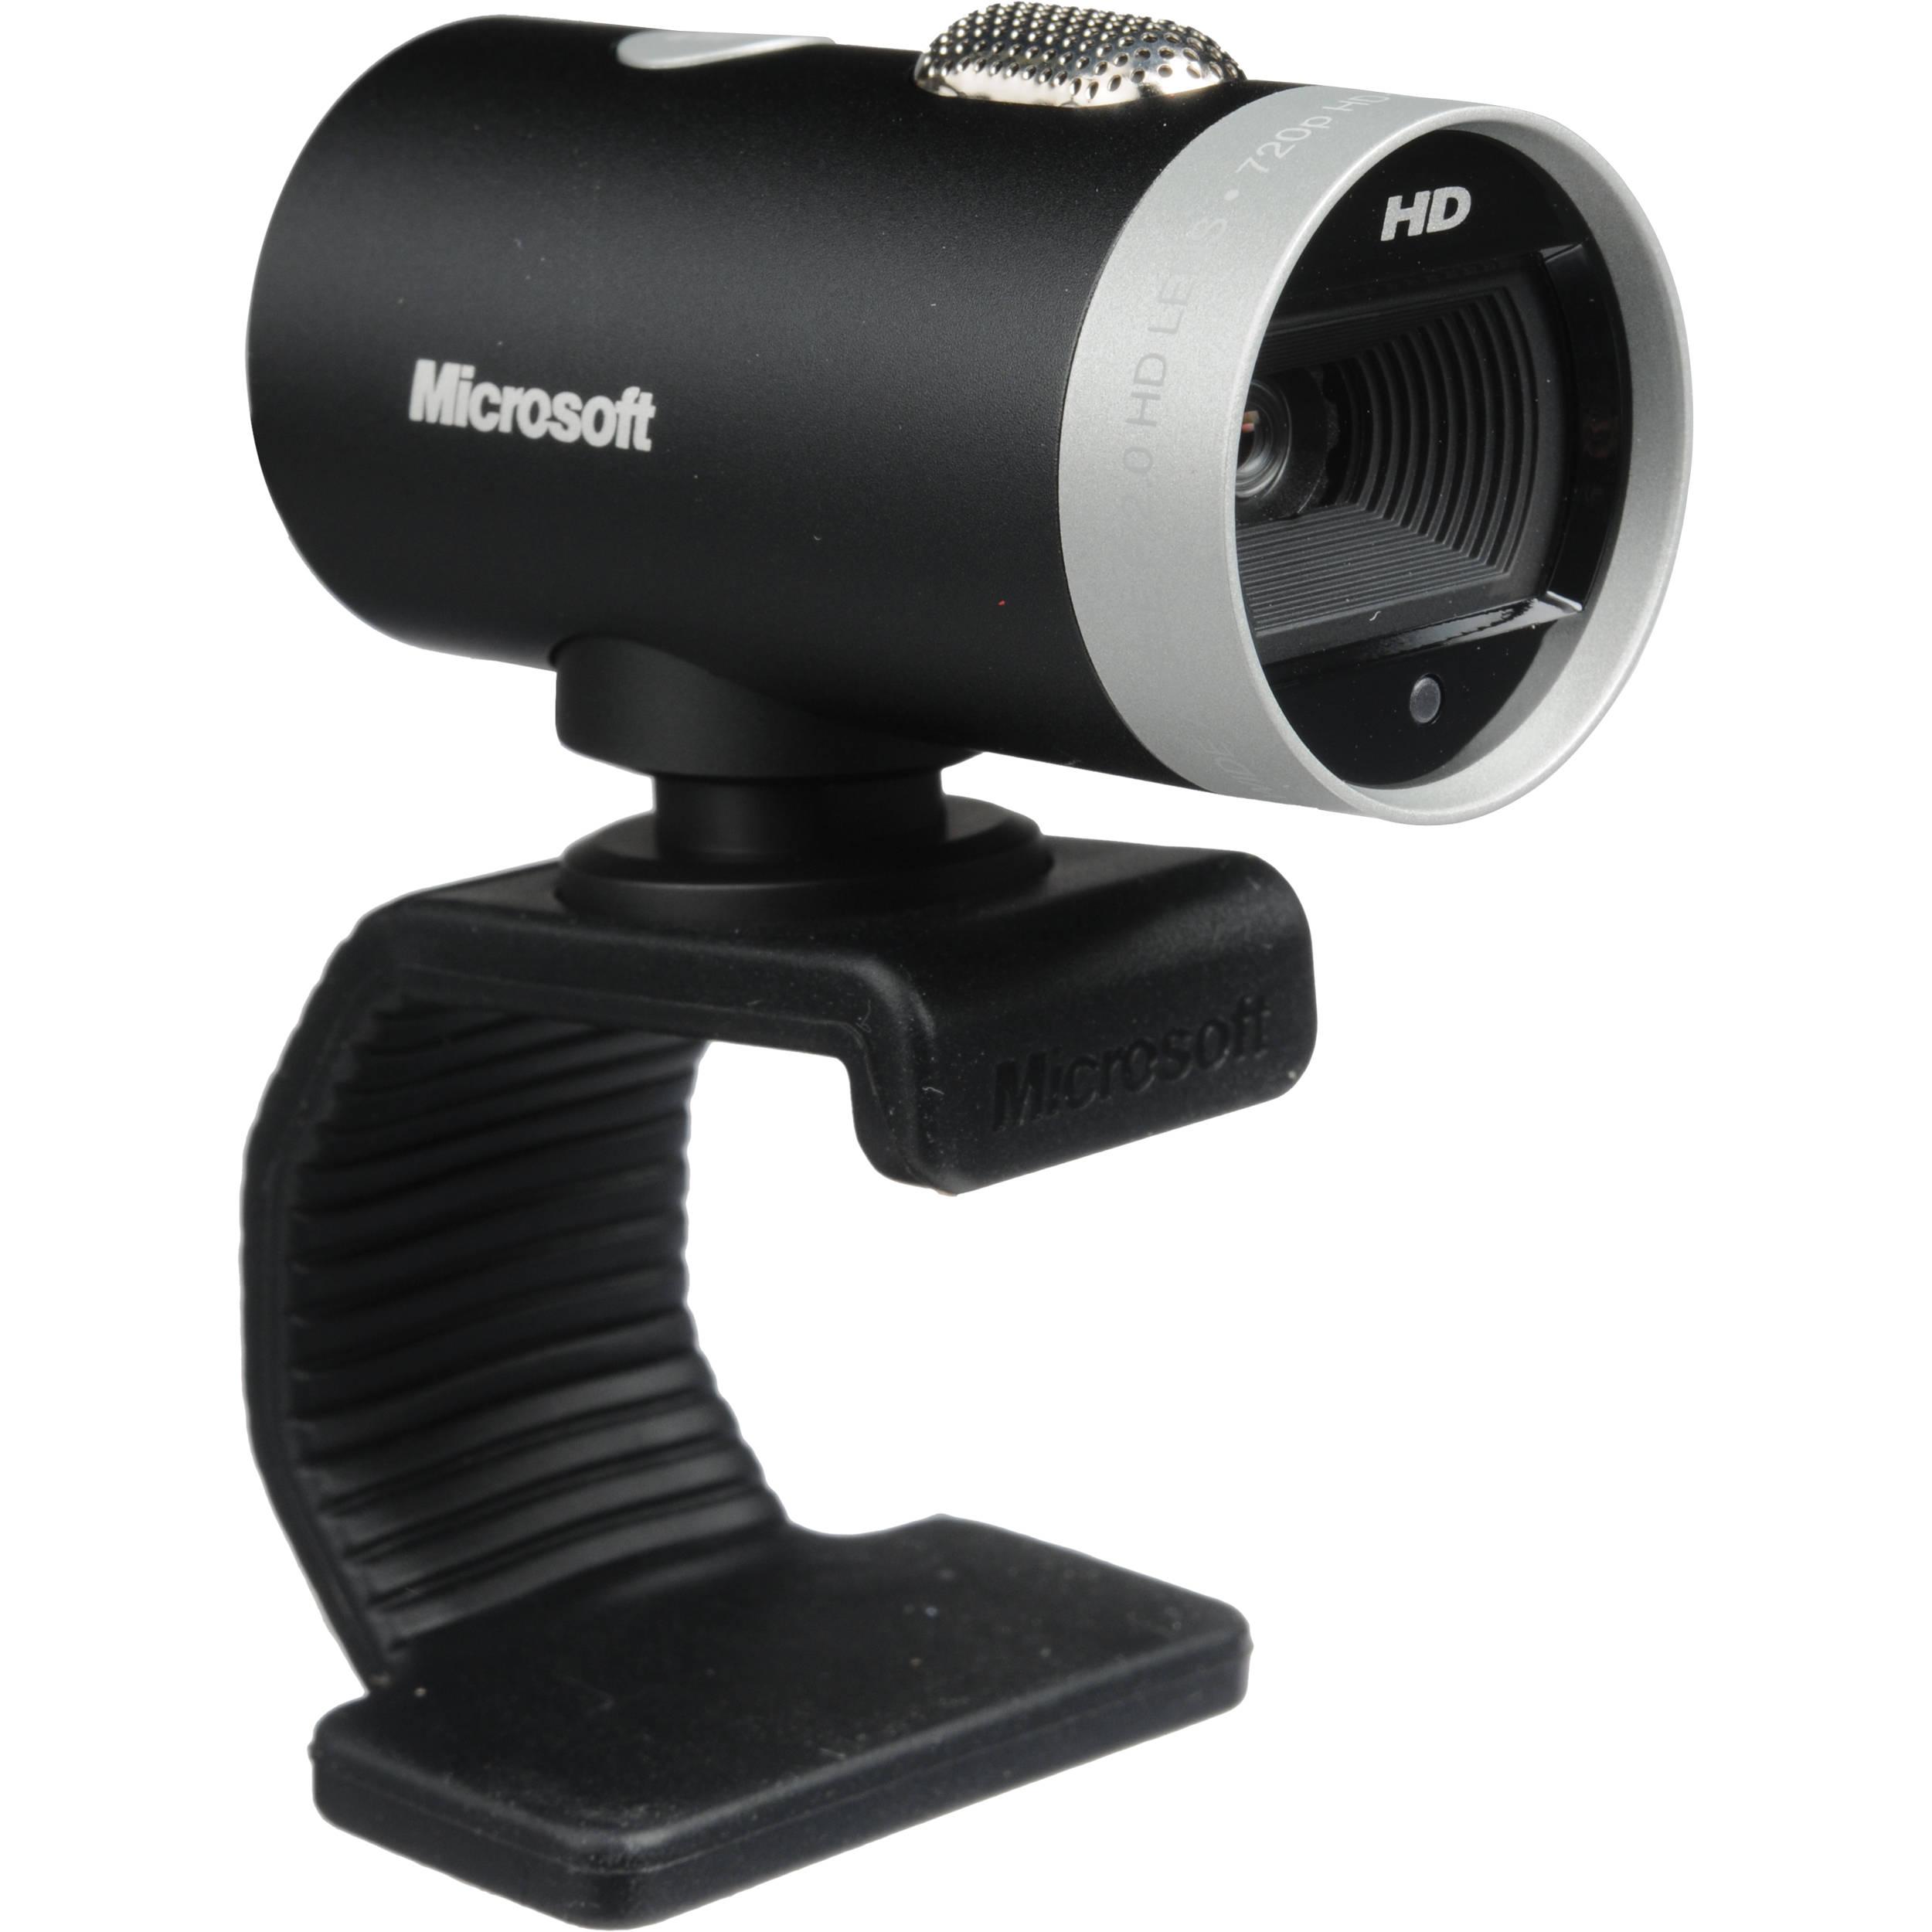 Microsoft Lifecam Cinema Webcam H5d 00001 B Amp H Photo Video